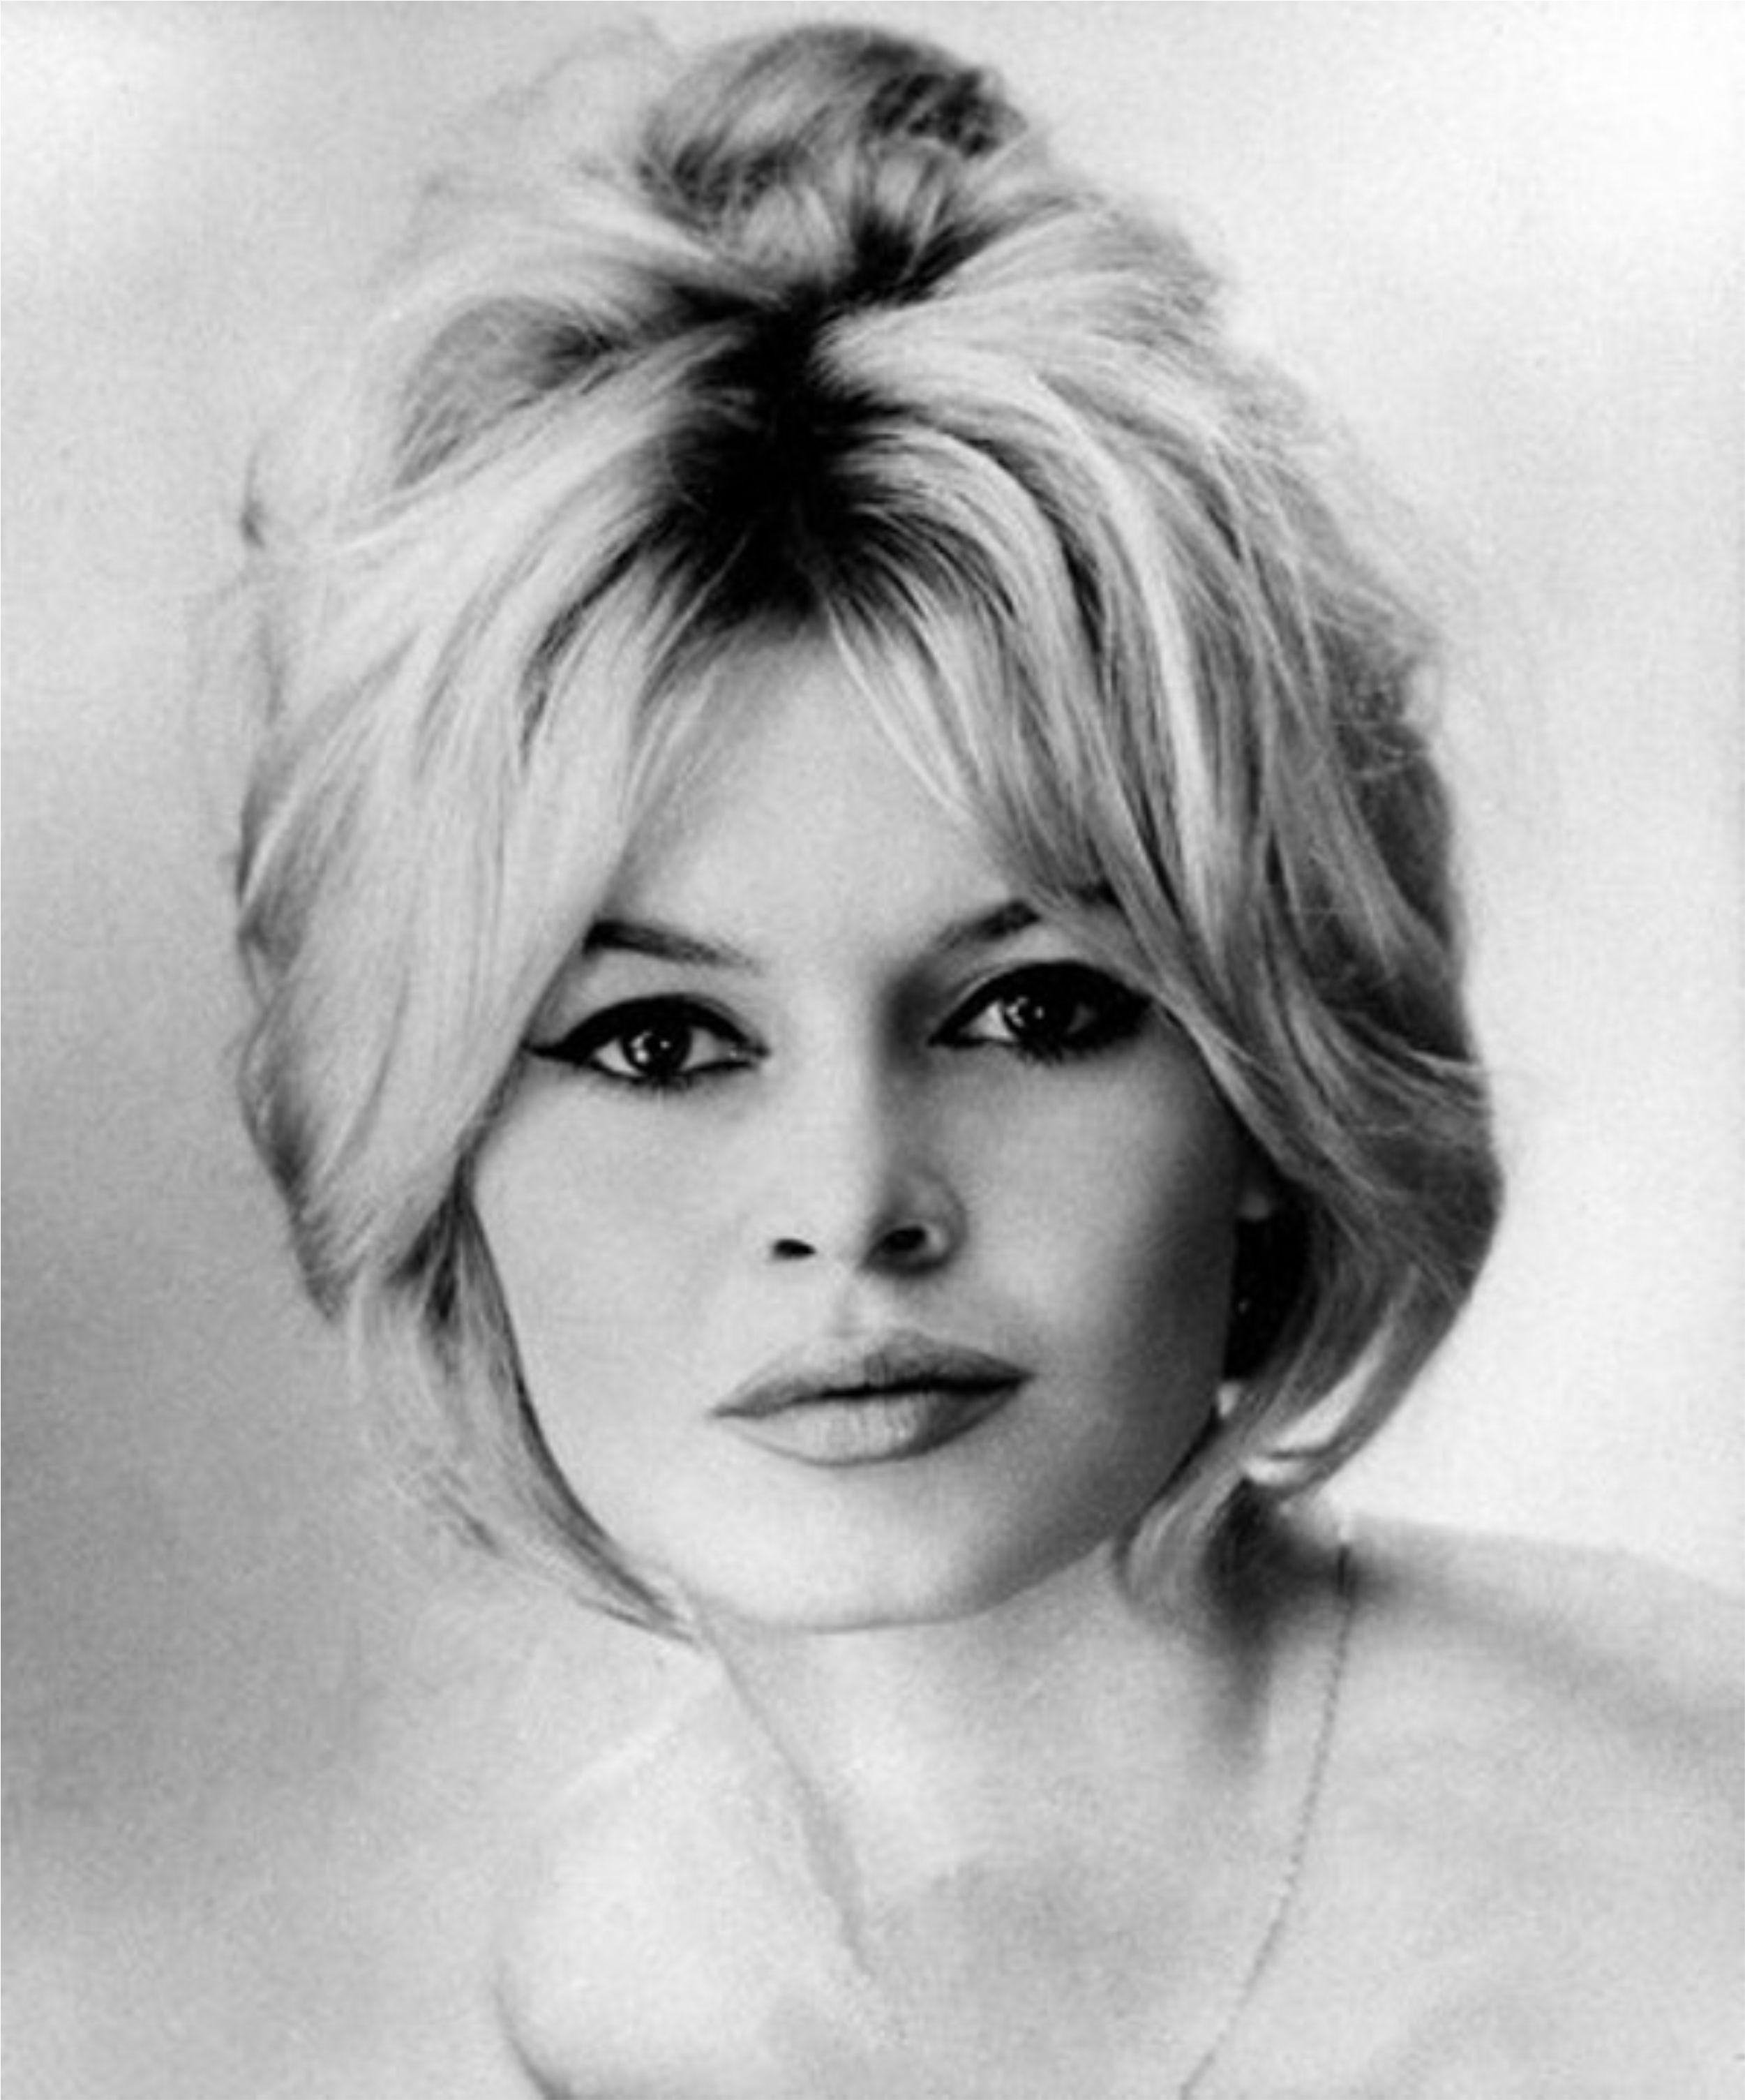 Hairstyle: Brigitte Bardot